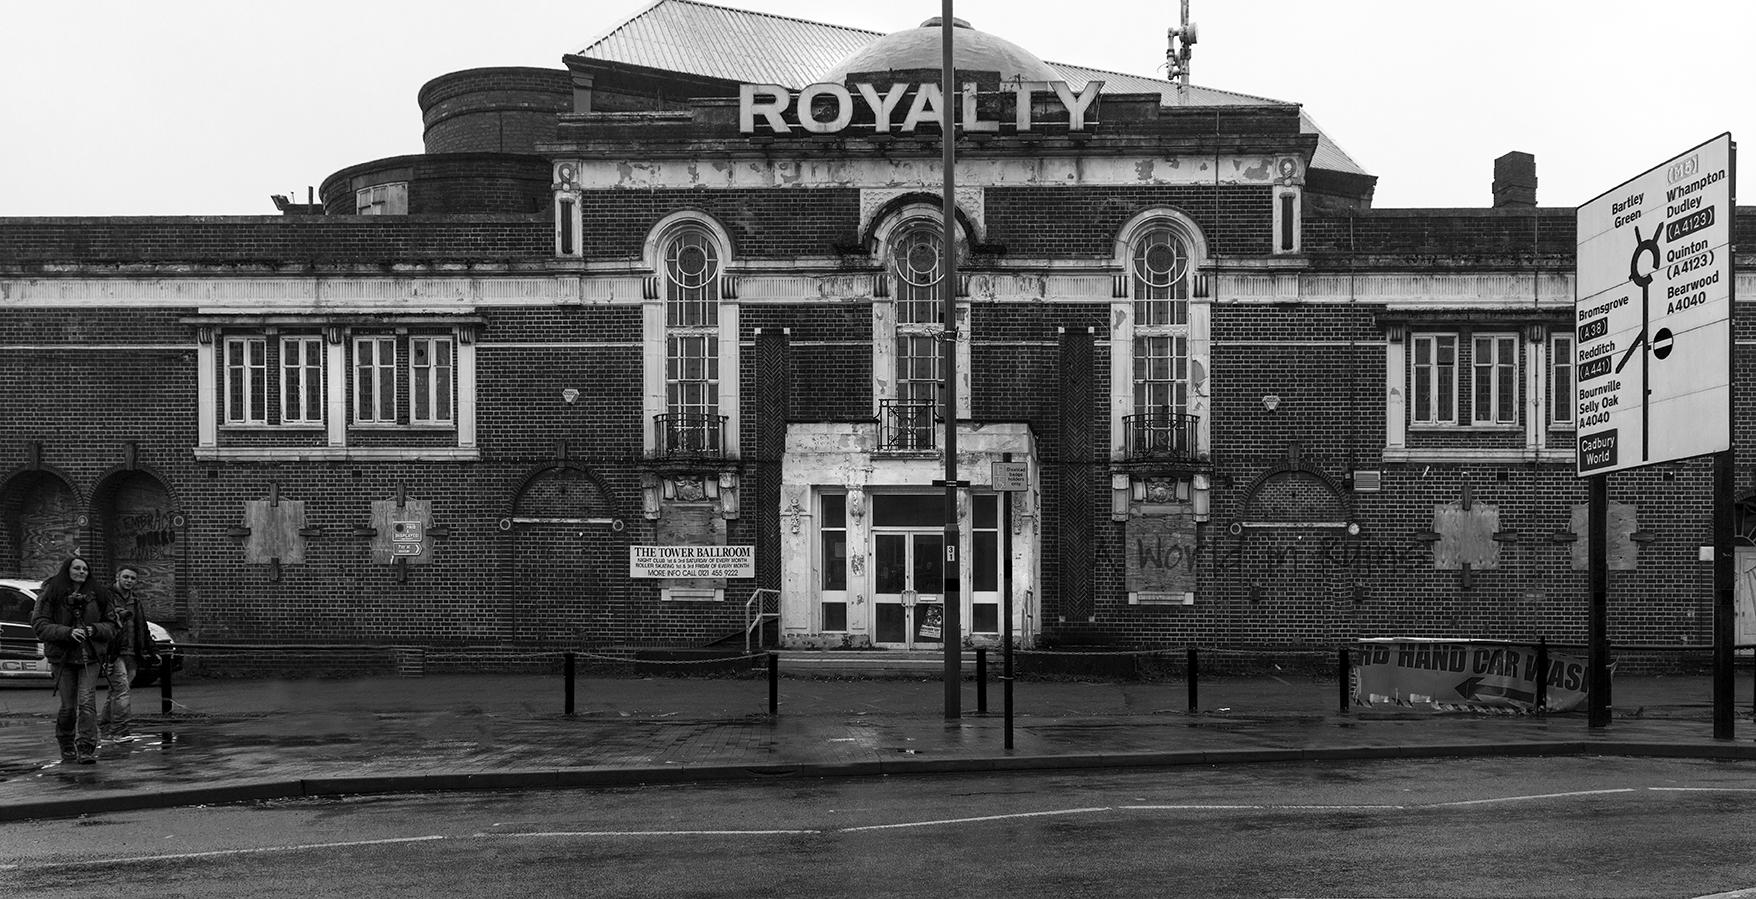 The Royalty Theatre Birmingham